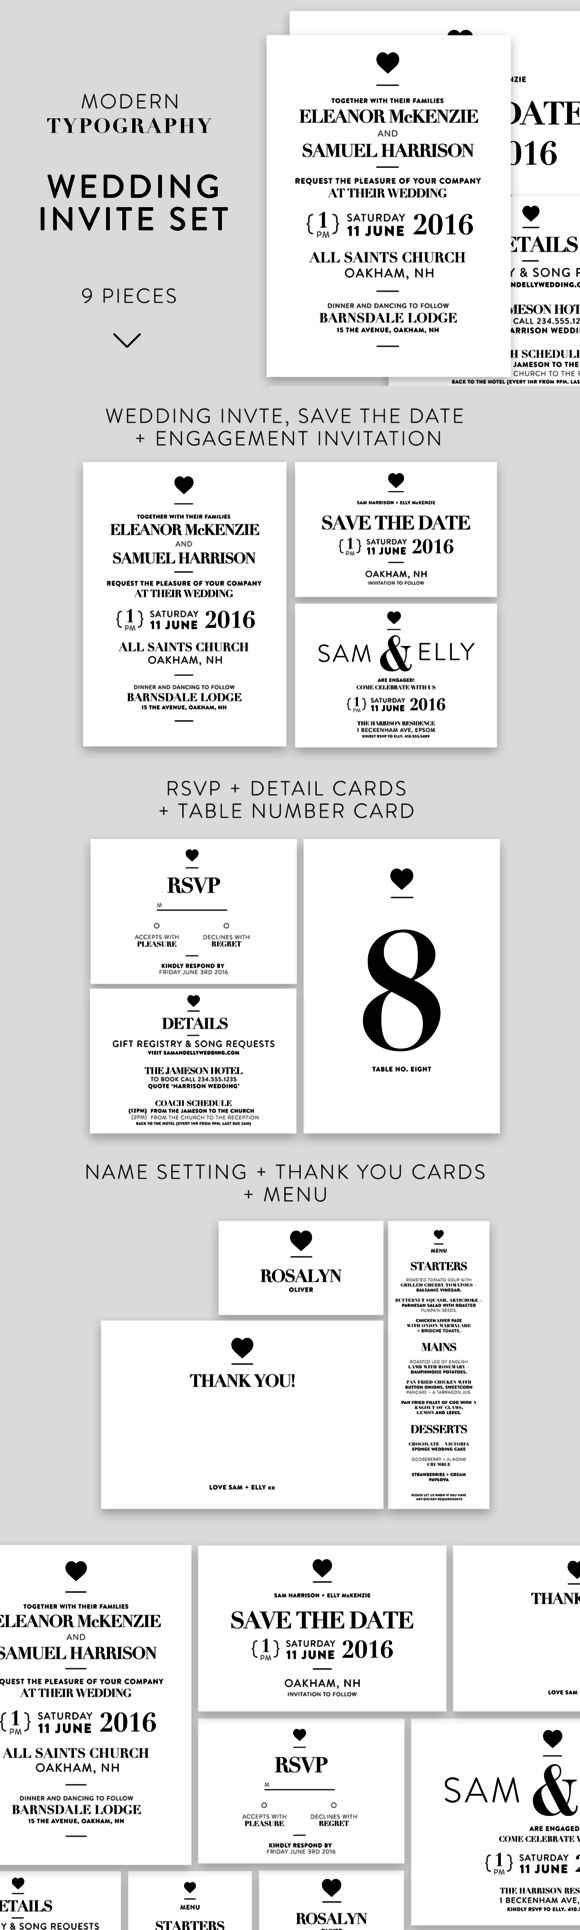 Modern Typography Wedding Invite Set by Wednesday Designs on @creativemarket